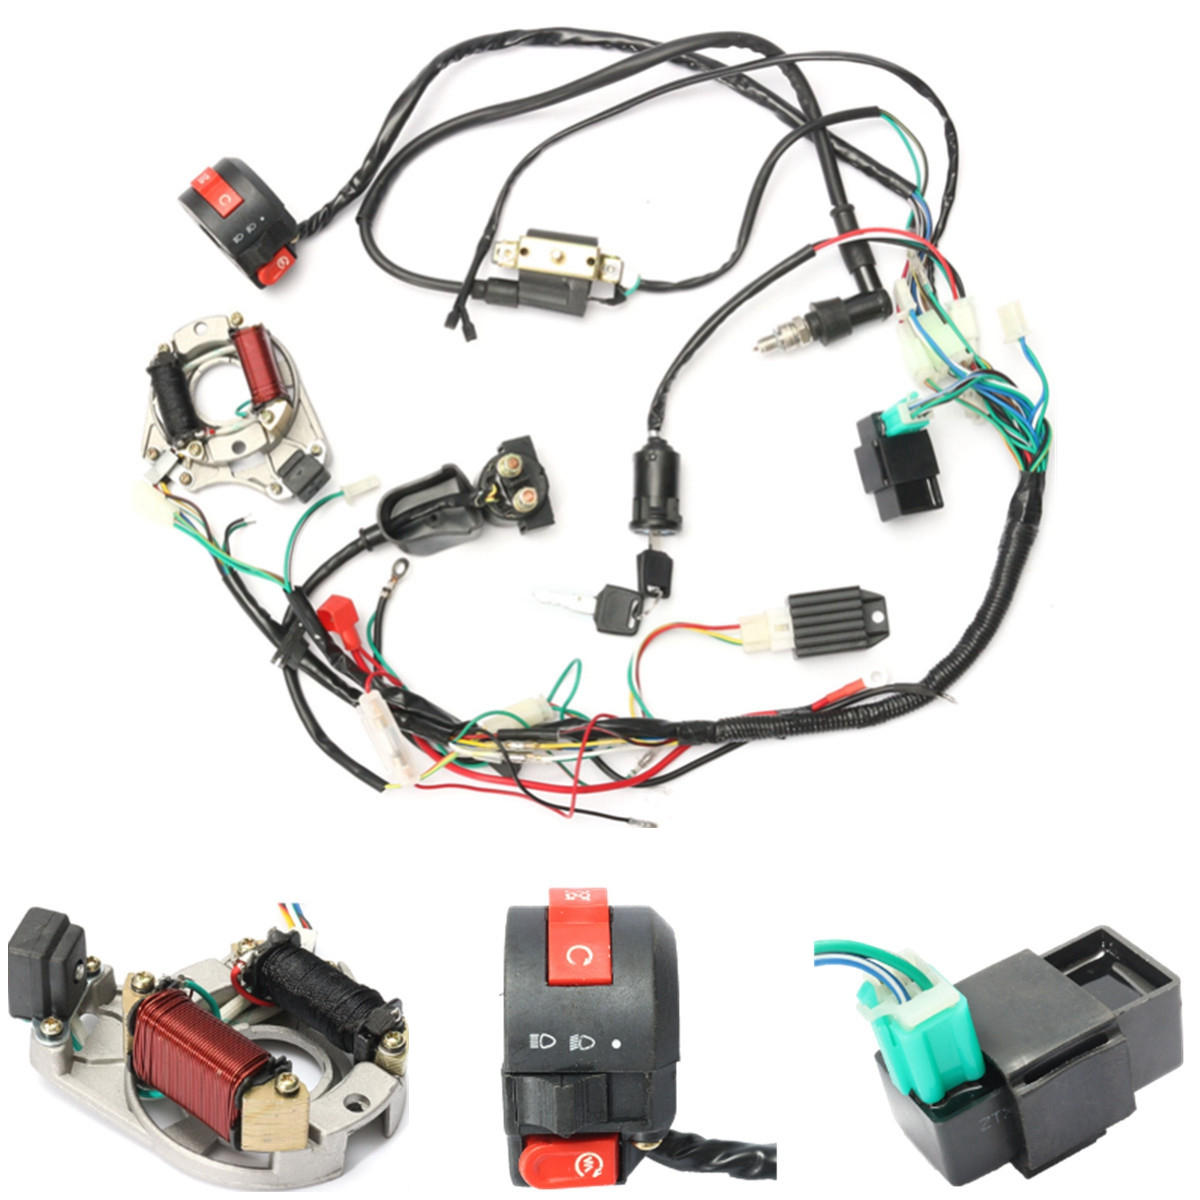 hight resolution of 50cc 70cc 90cc 110cc cdi wire harness assembly wiring kit atv electric start quad buyang 110cc atv wiring harness 110 atv wiring harness